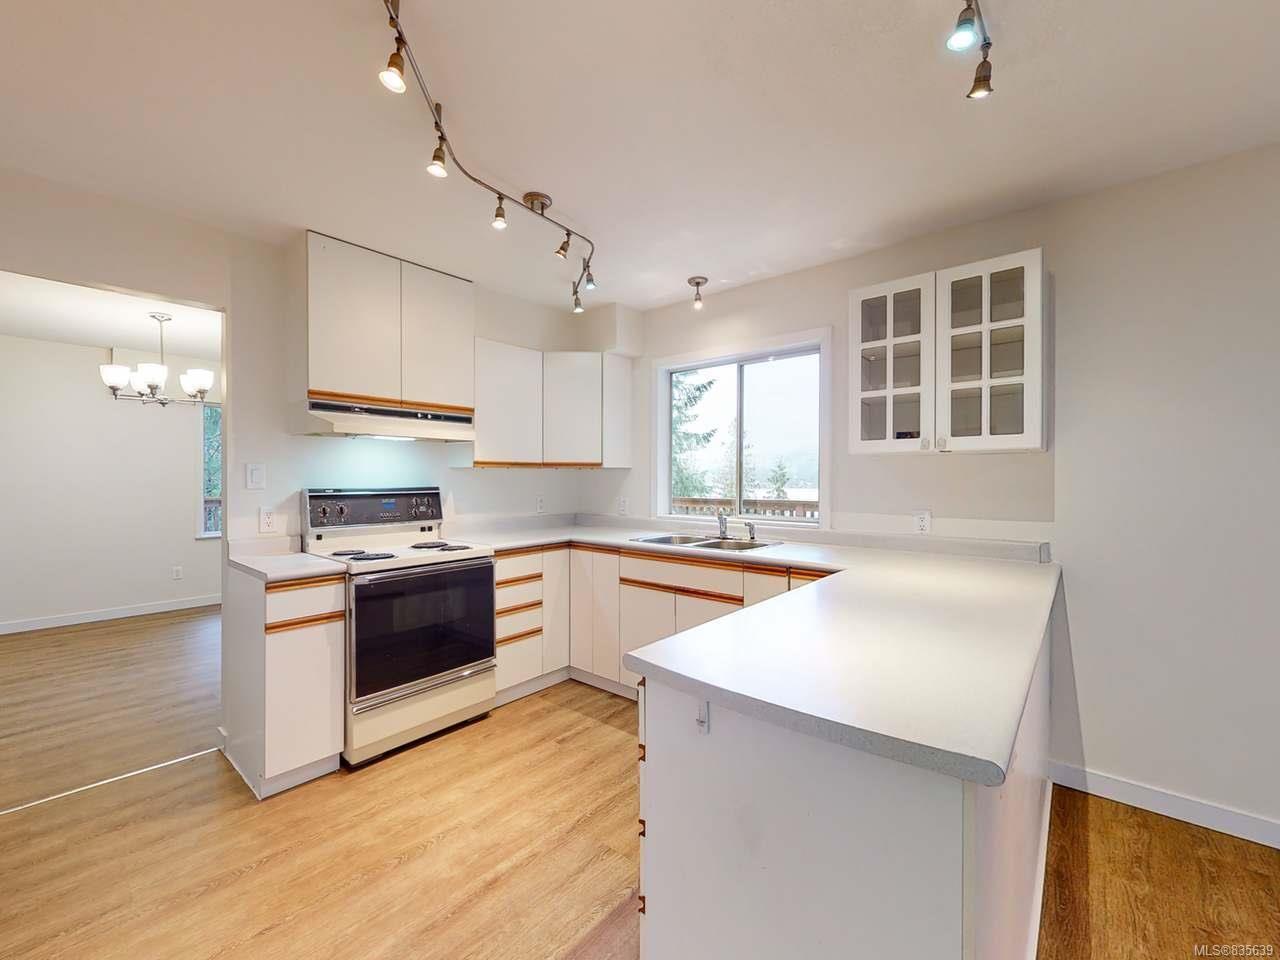 Photo 12: Photos: 9657 Faber Rd in PORT ALBERNI: PA Sproat Lake House for sale (Port Alberni)  : MLS®# 835639